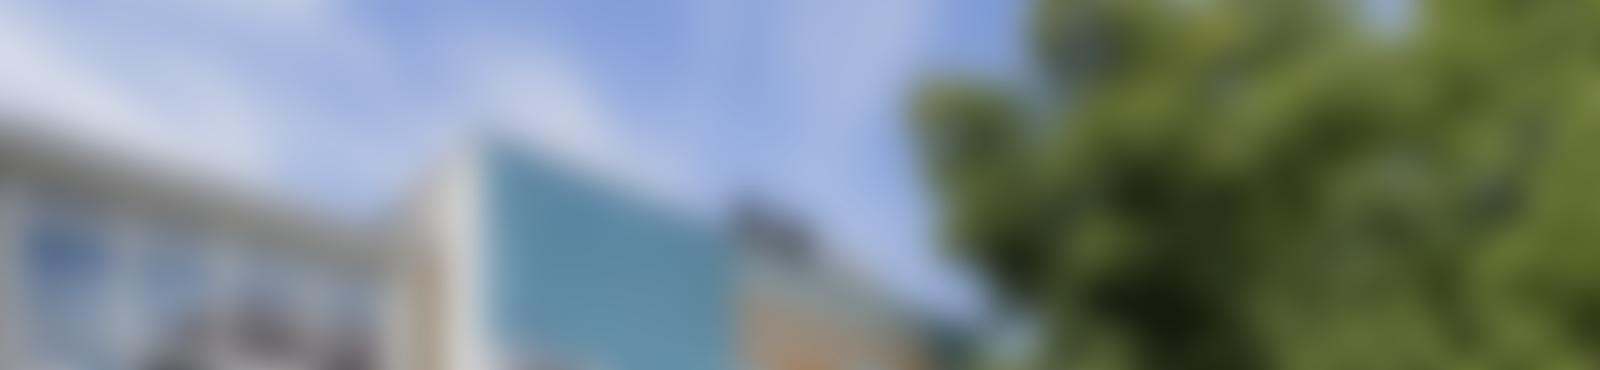 Blurred 1 amerika haus drau en